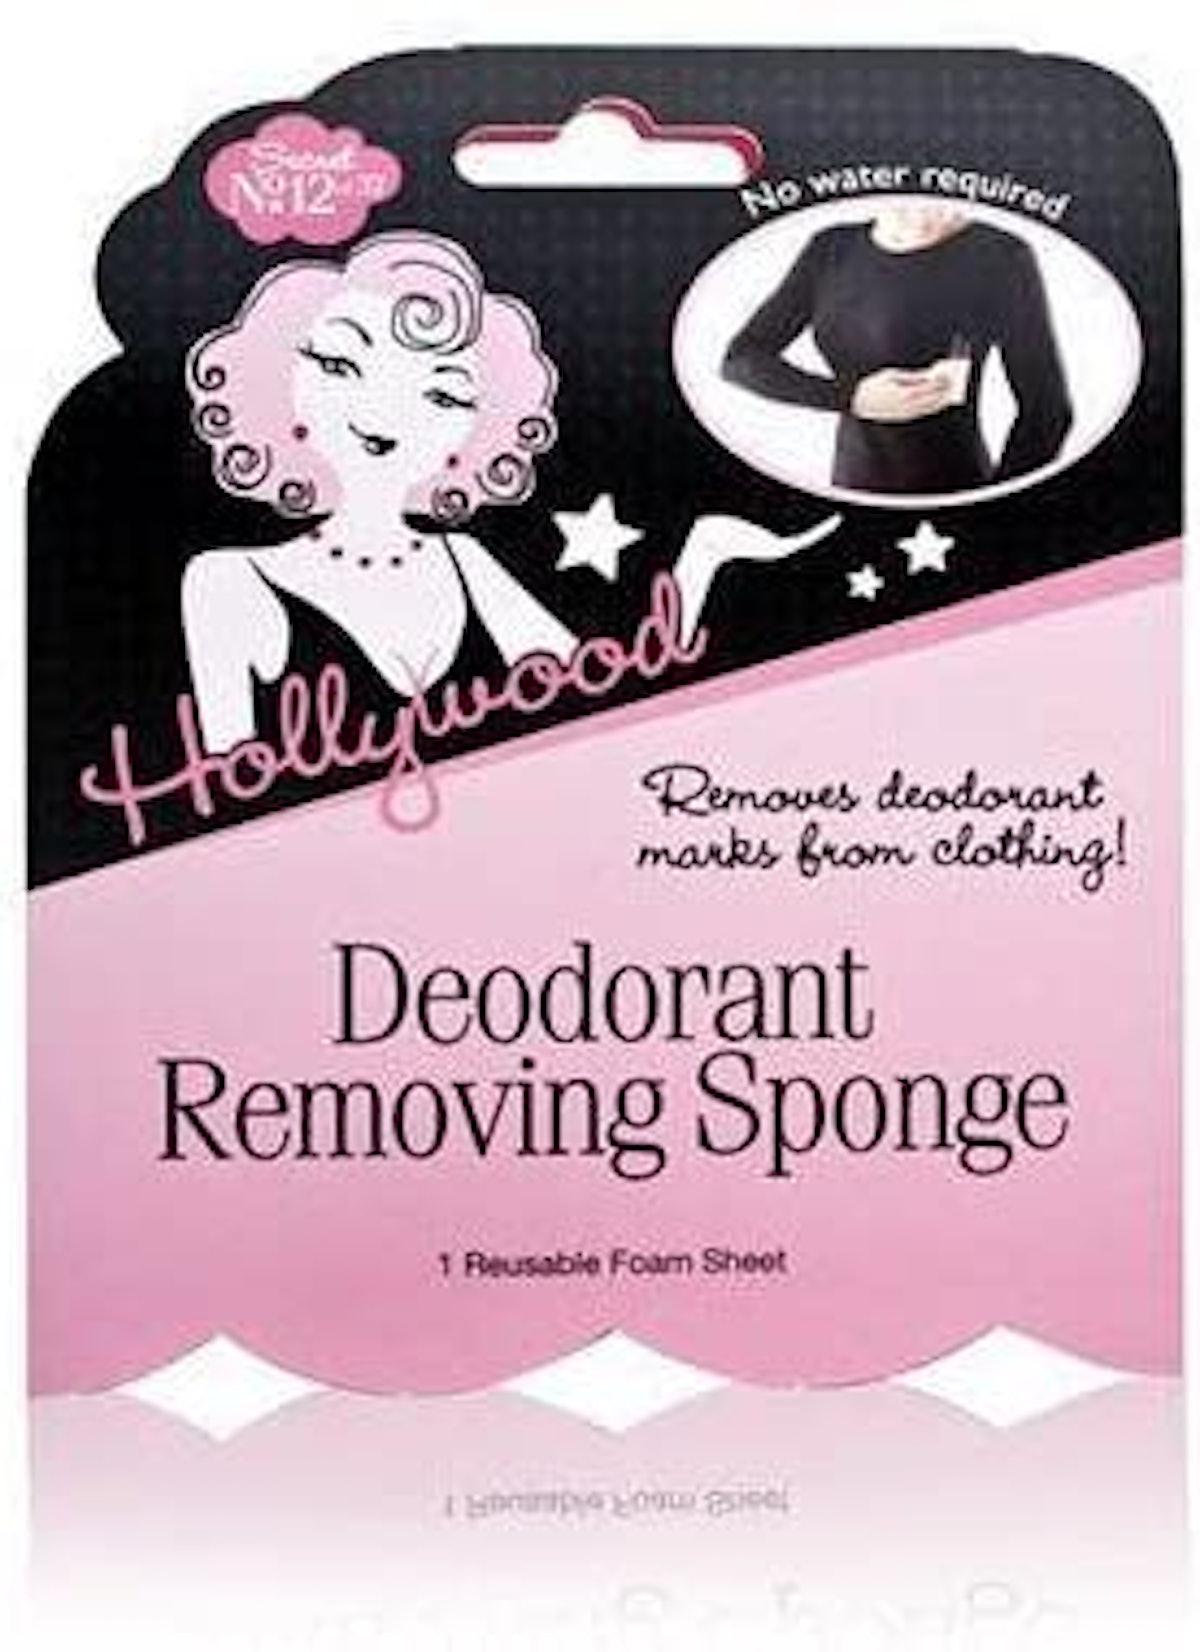 Hollywood Deodorant Removing Sponge